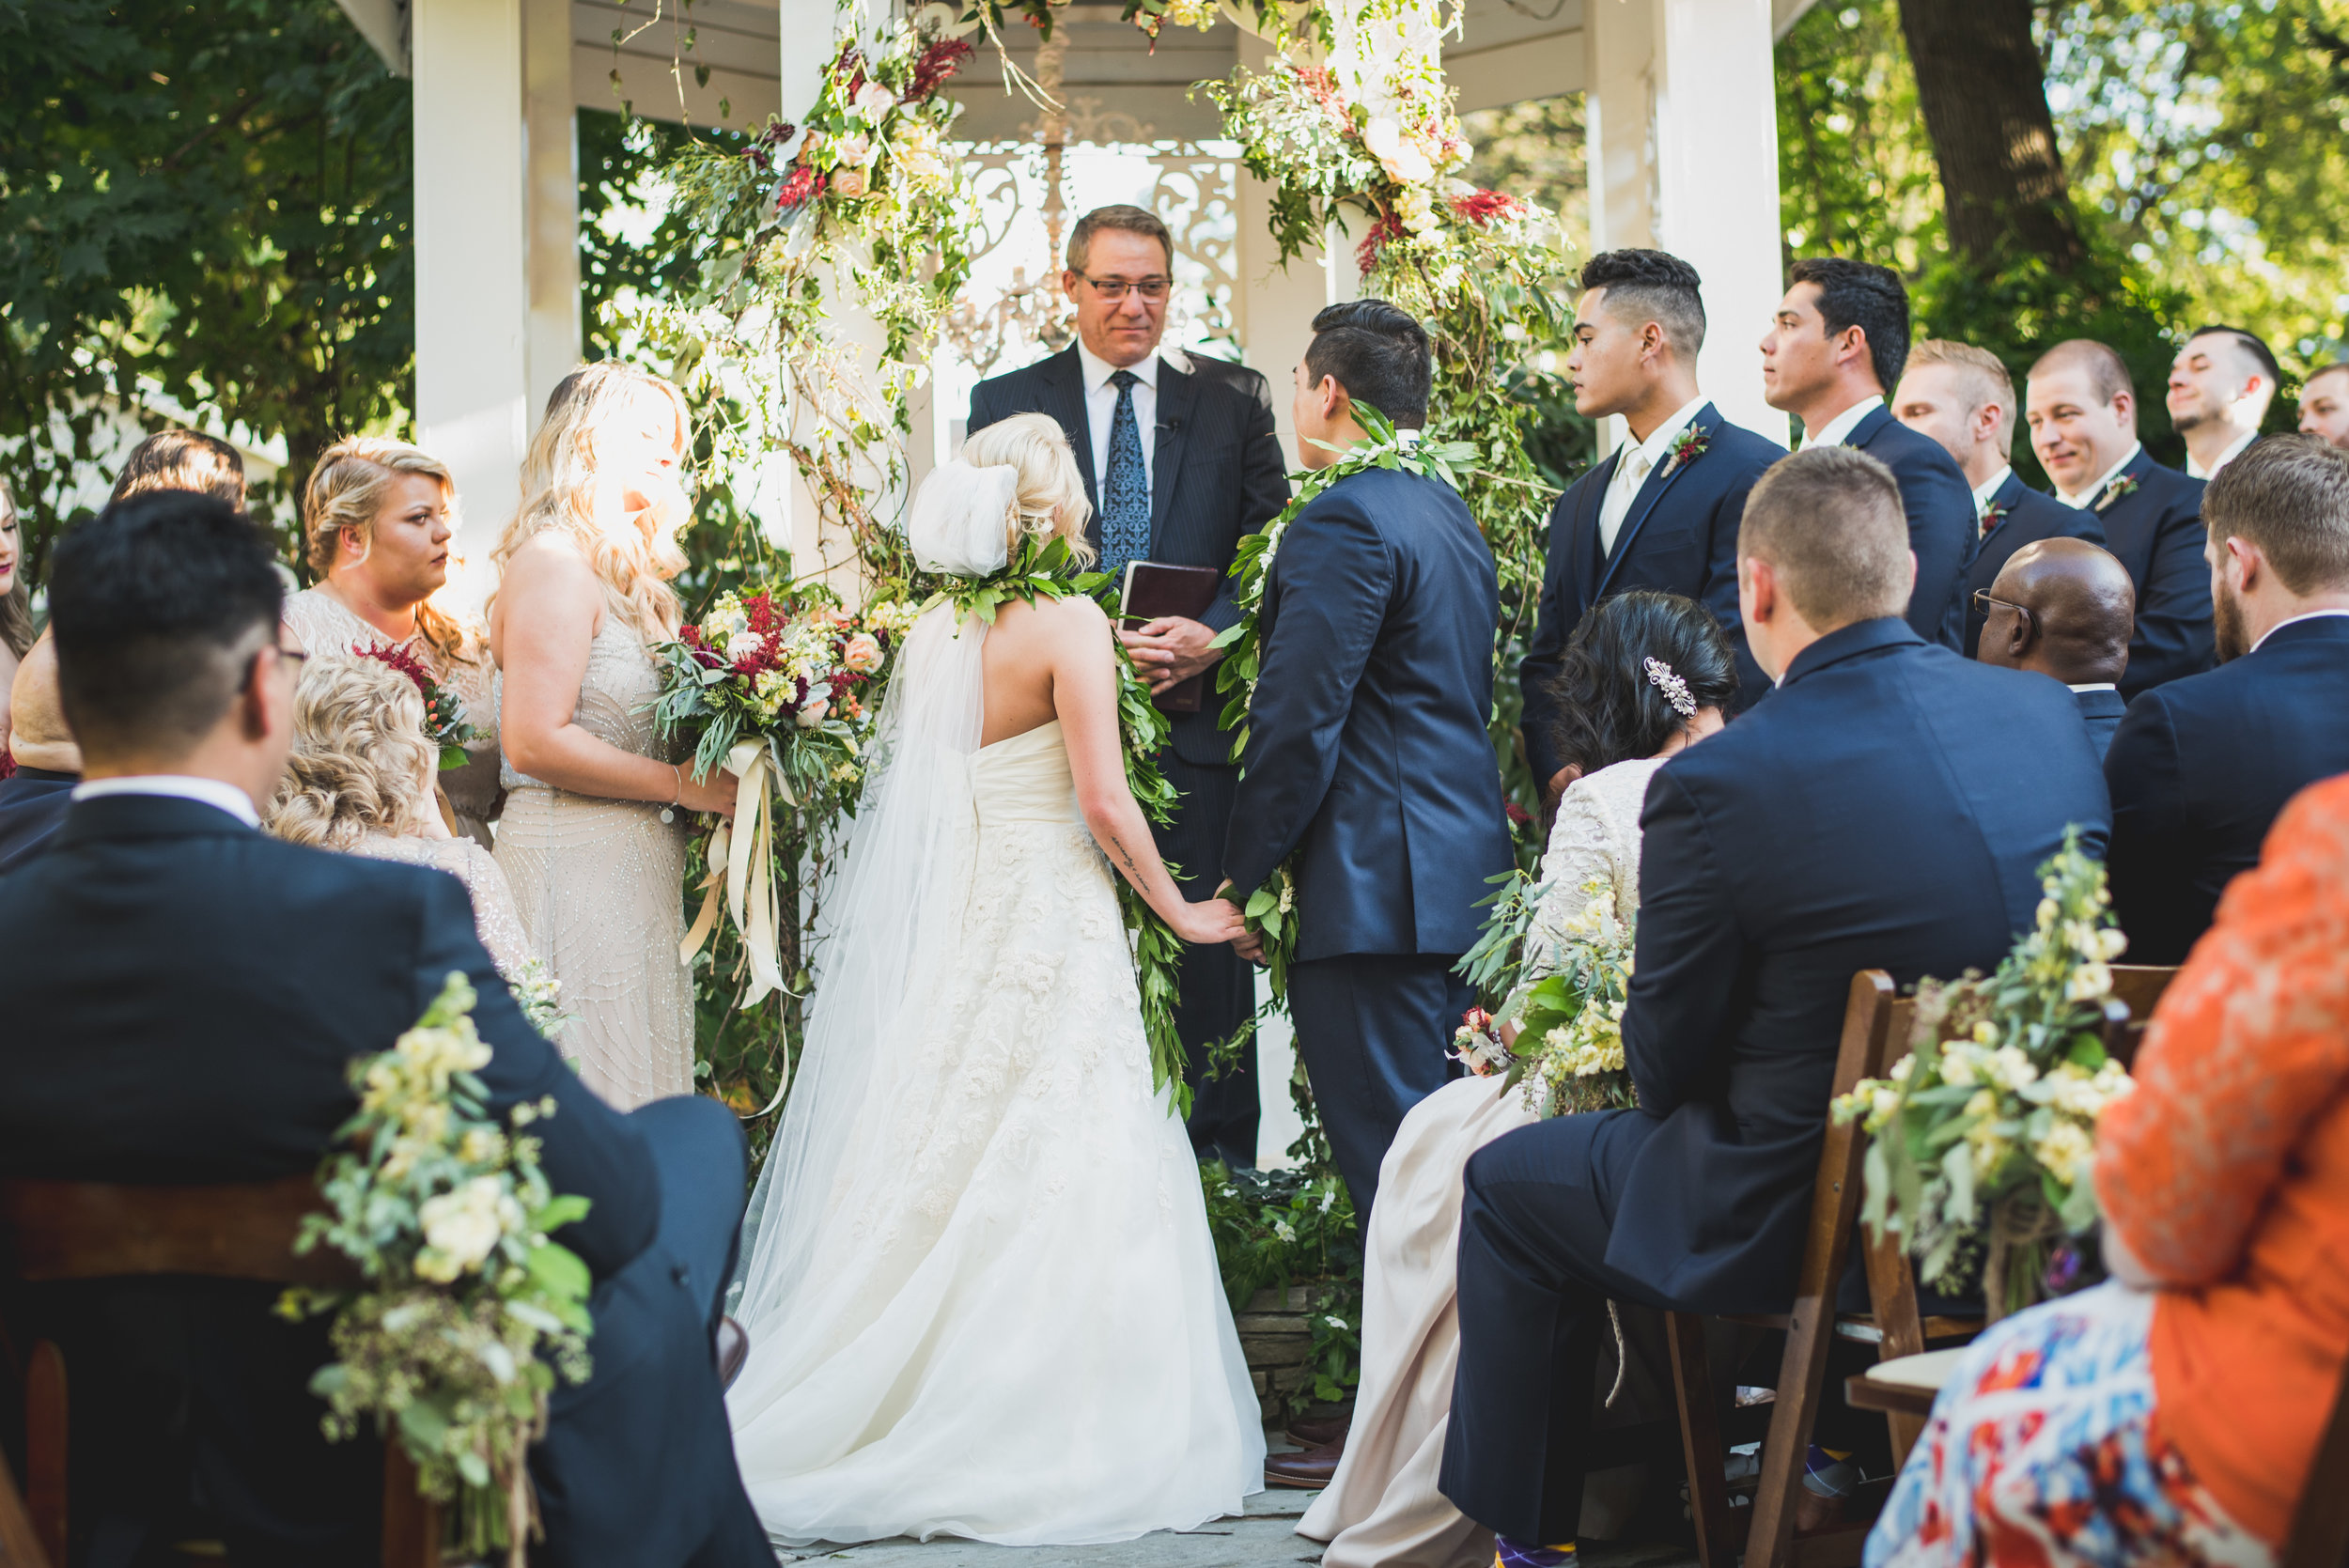 Nashville-wedding-photographers-CJ's-Off-The-Square-34.JPG